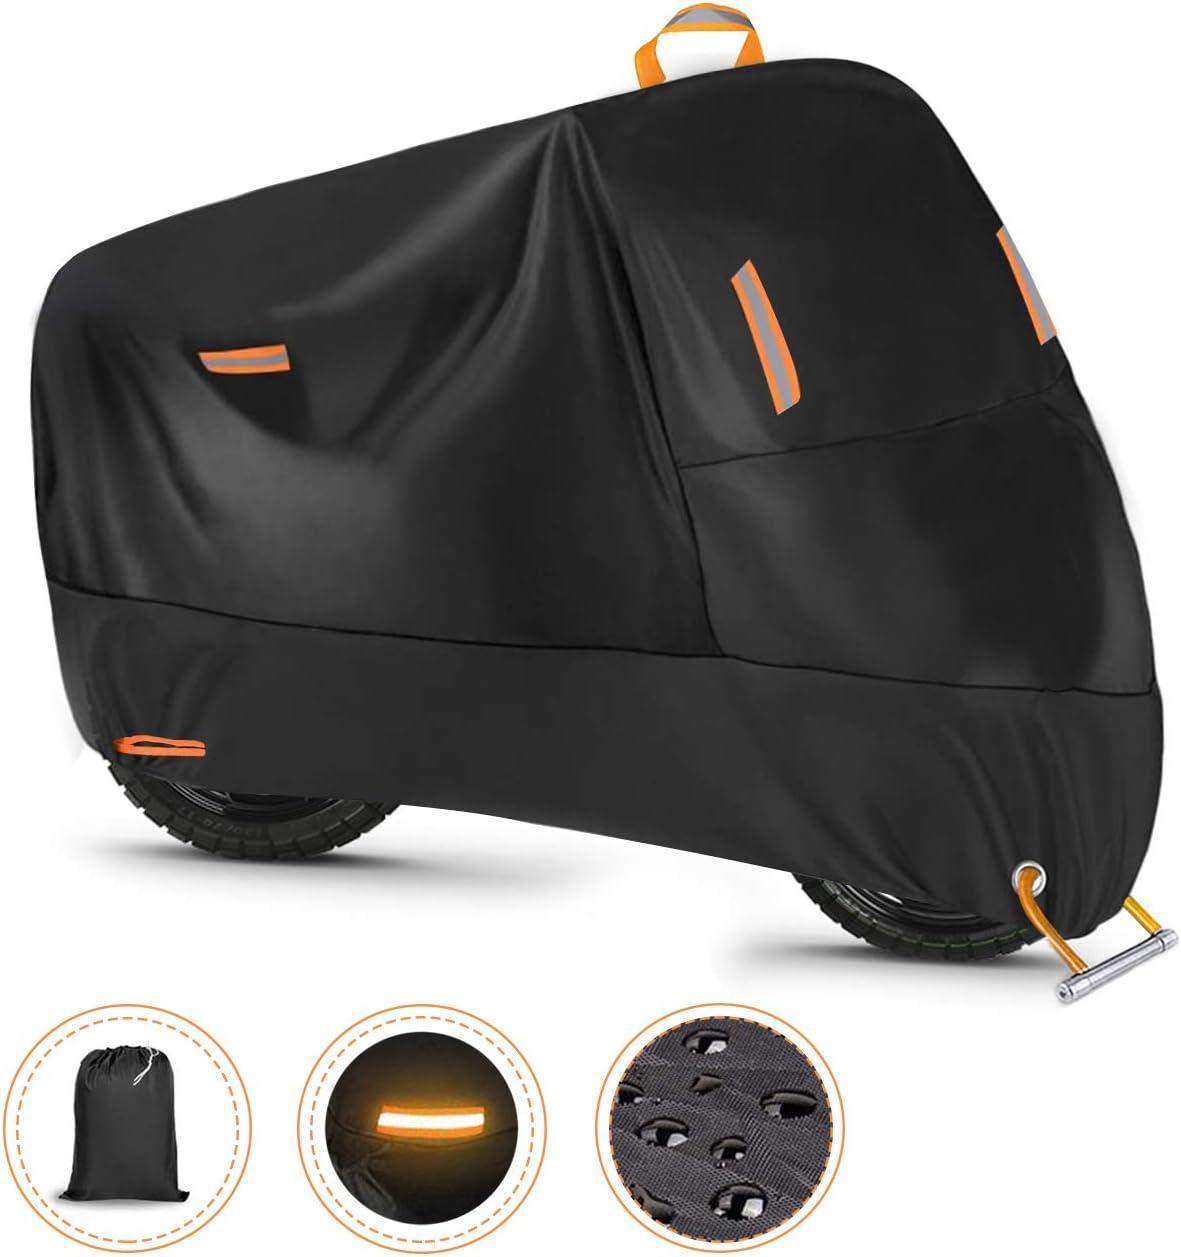 Ergocar Funda para Moto Impermeable Cubierta de la Motocicleta Resistente al Viento 300D Cubierta UV Protectora de Poliéster, XXXL (104.3